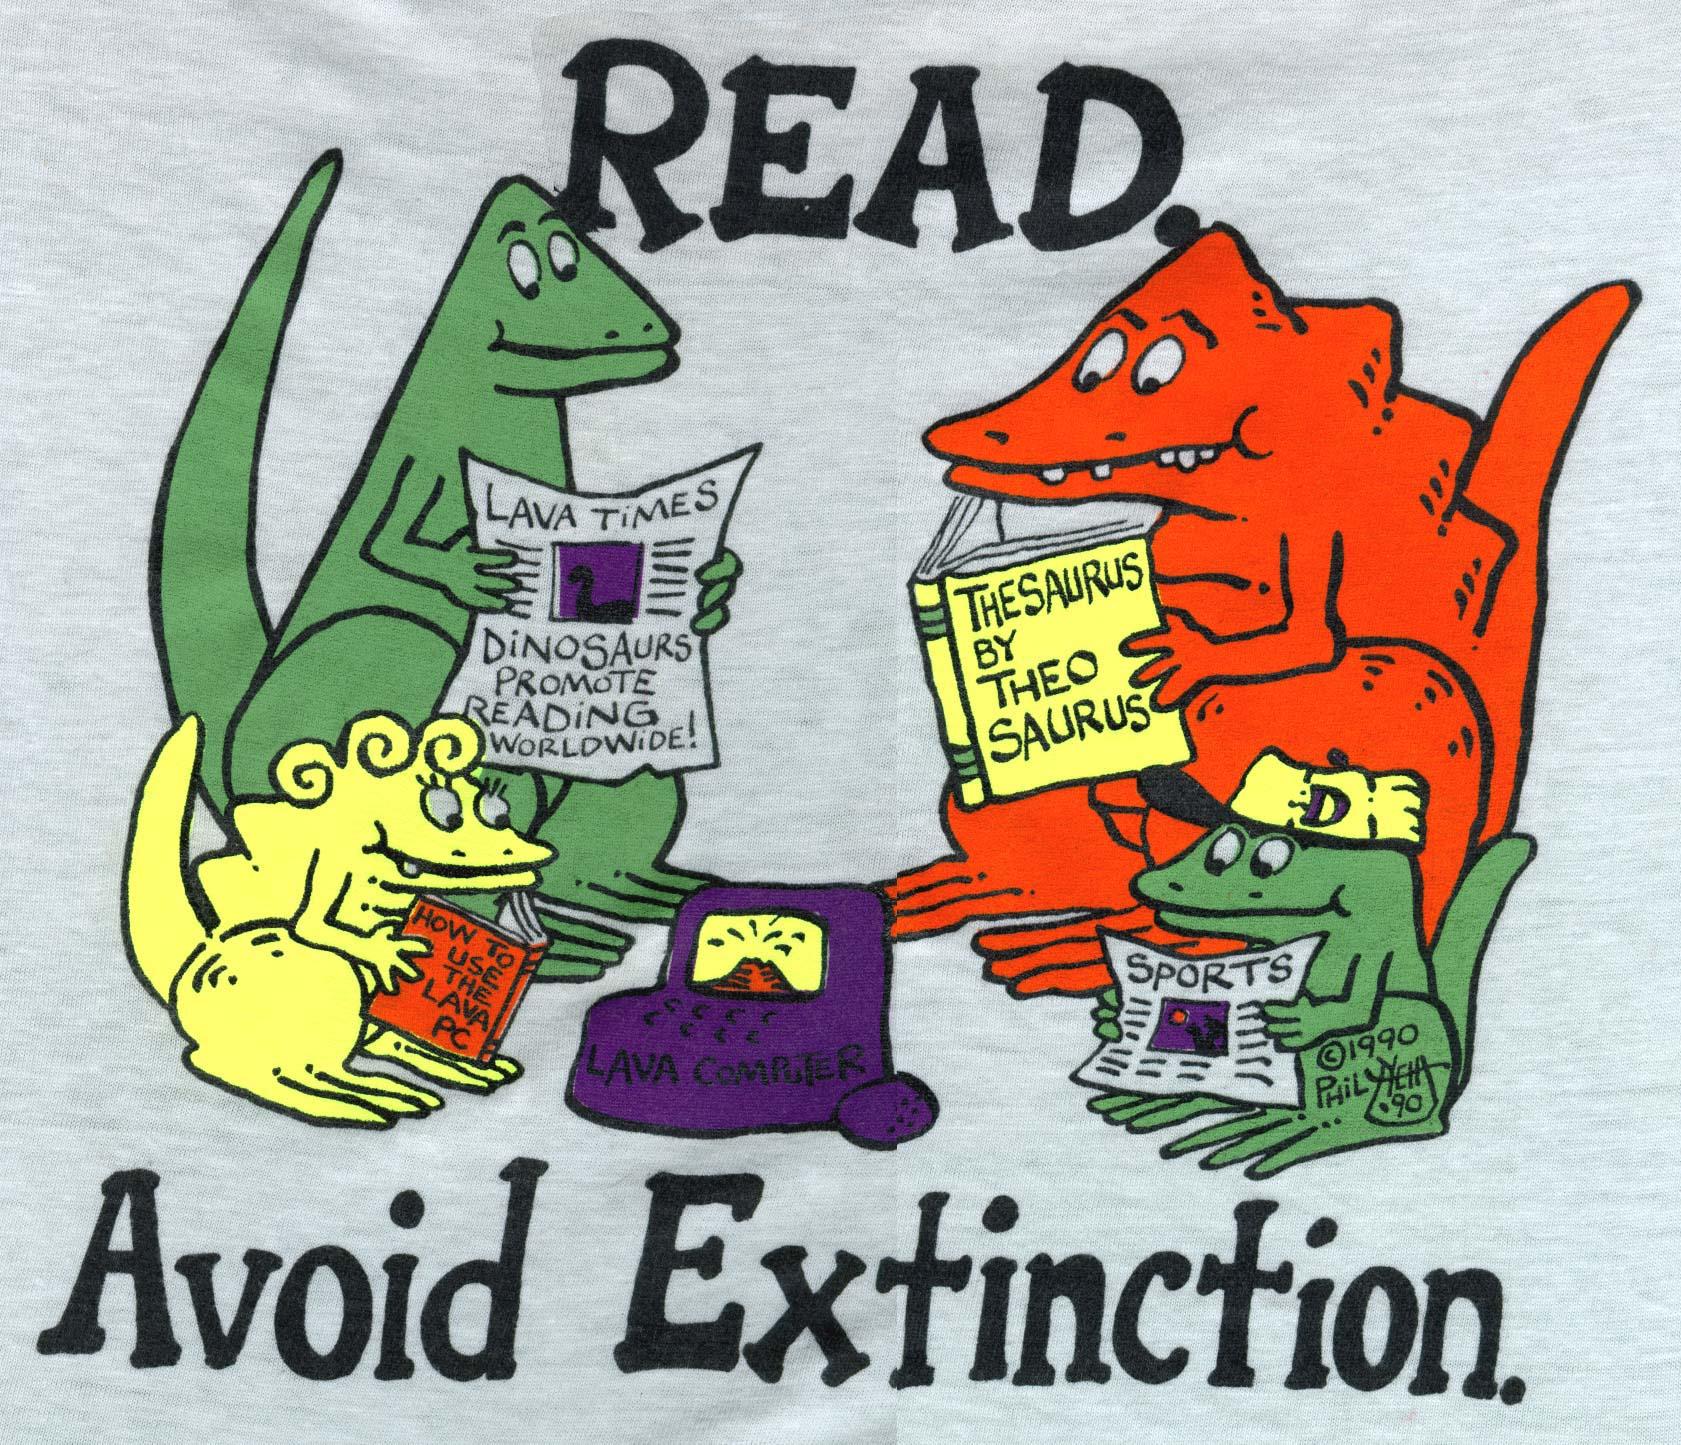 Read to avoid extinction